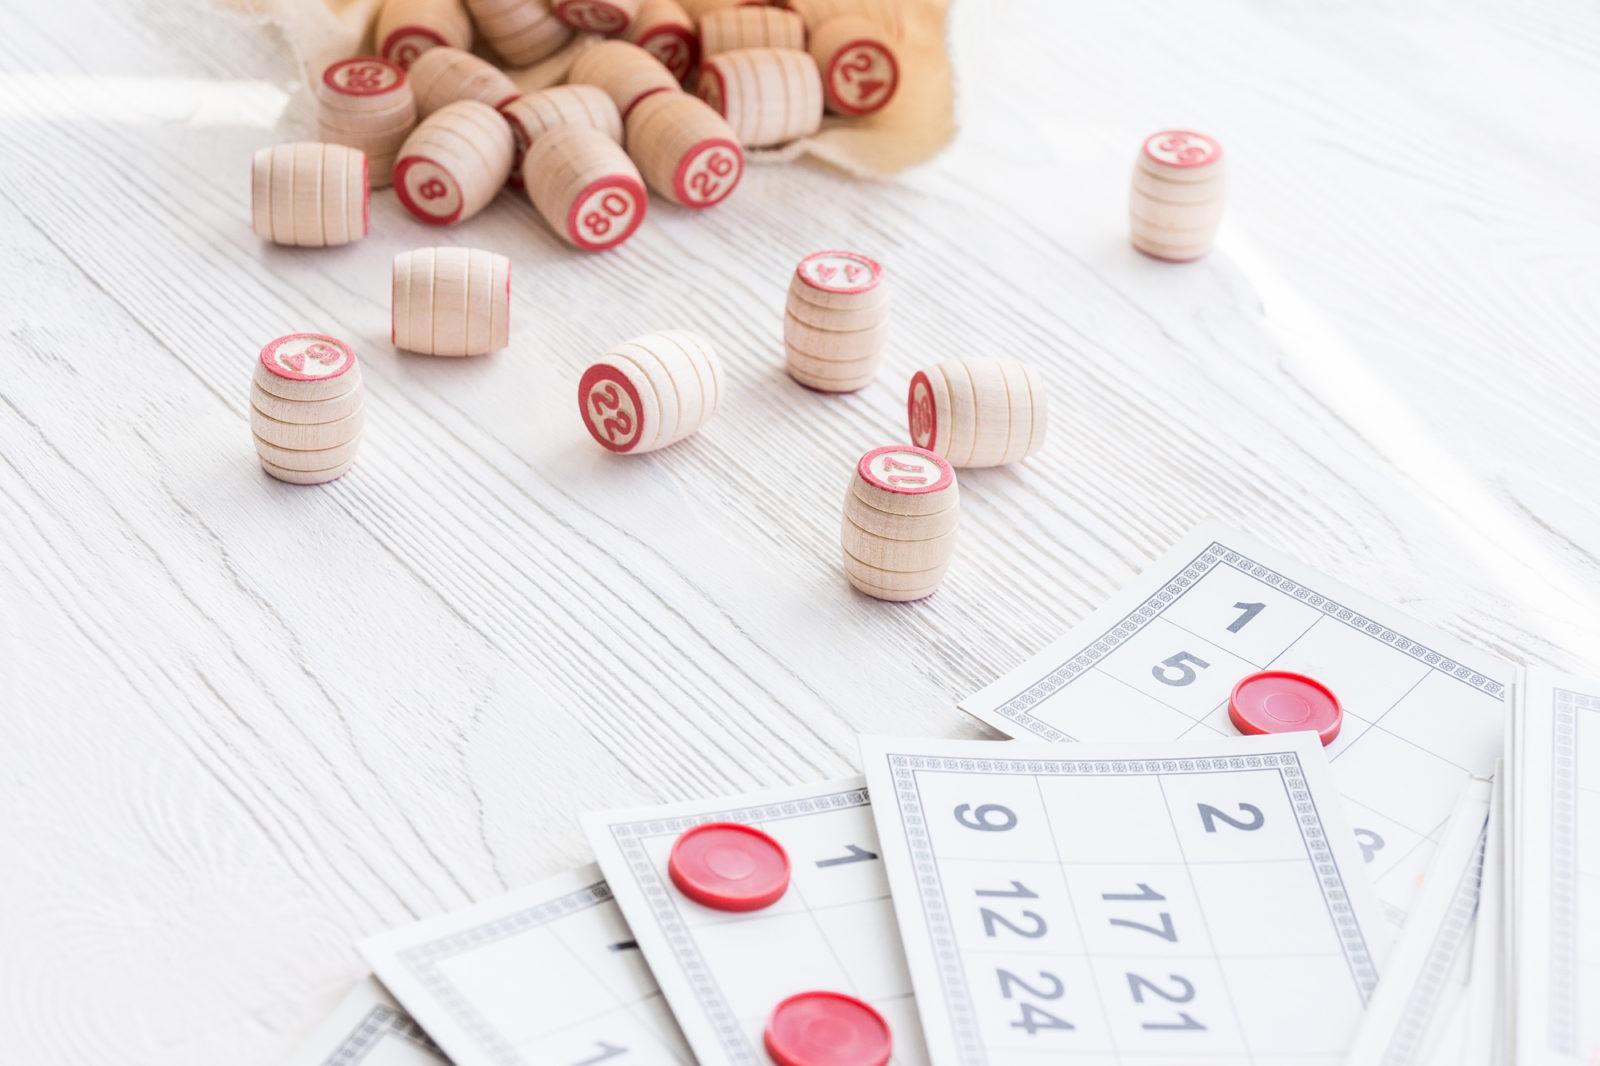 spilled bingo markers